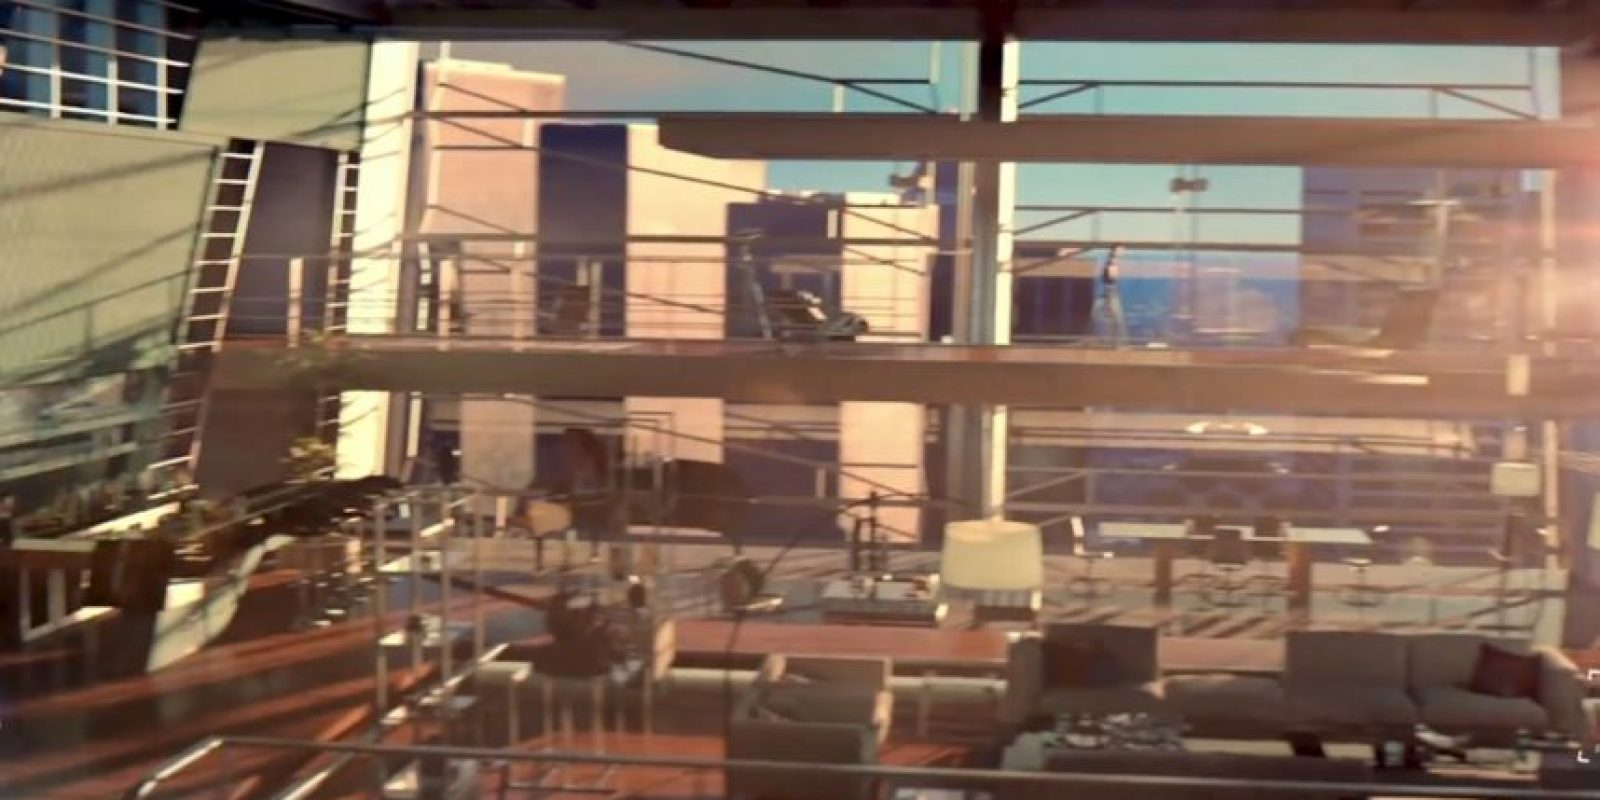 Puede ver la base de S.H.I.E.L.D. Foto:vía/Youtube Samsung